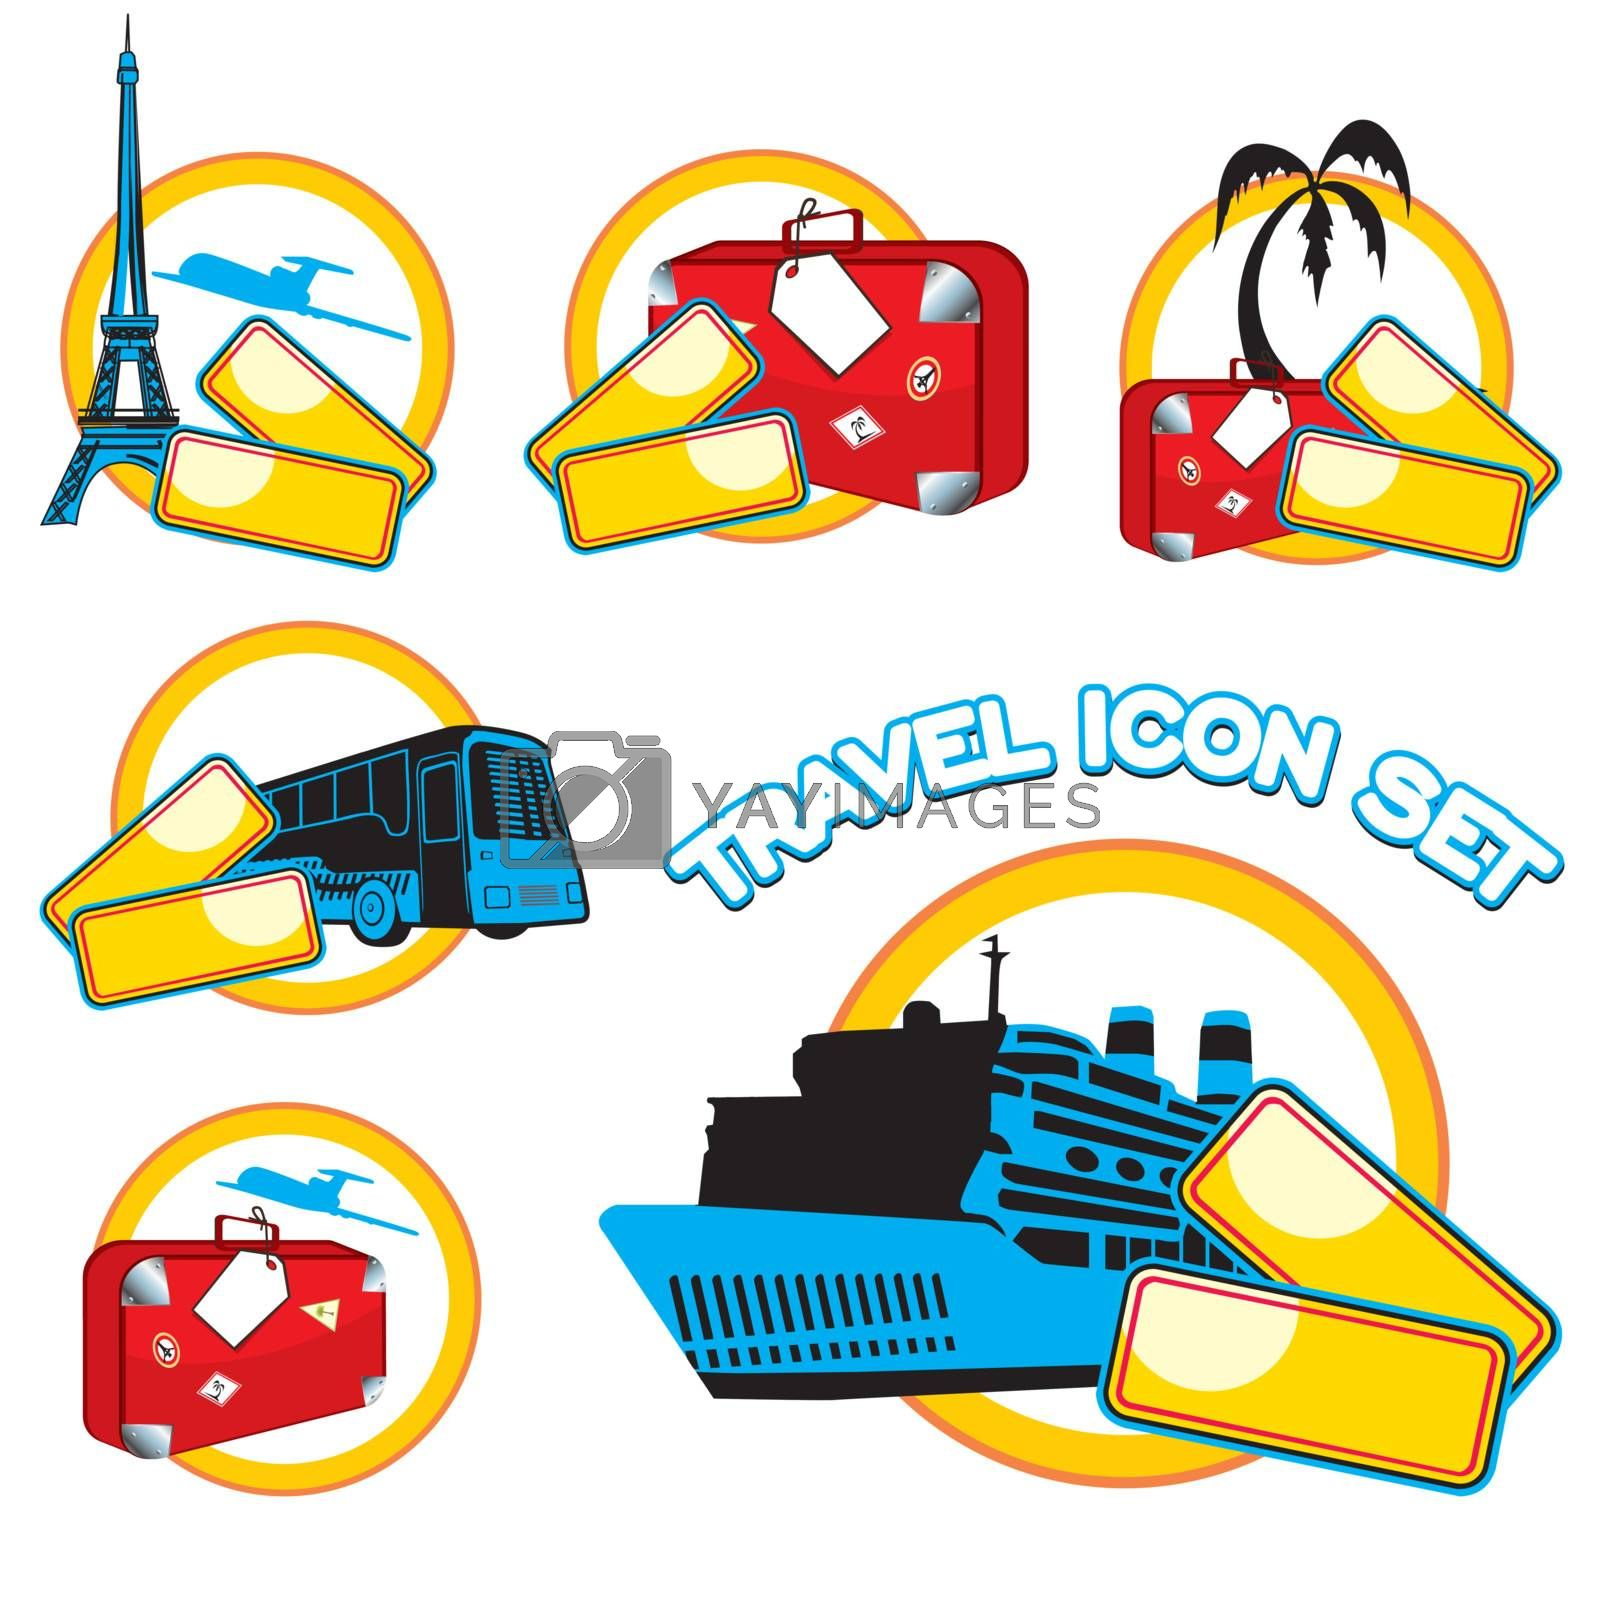 Travel icon set, vector illustration